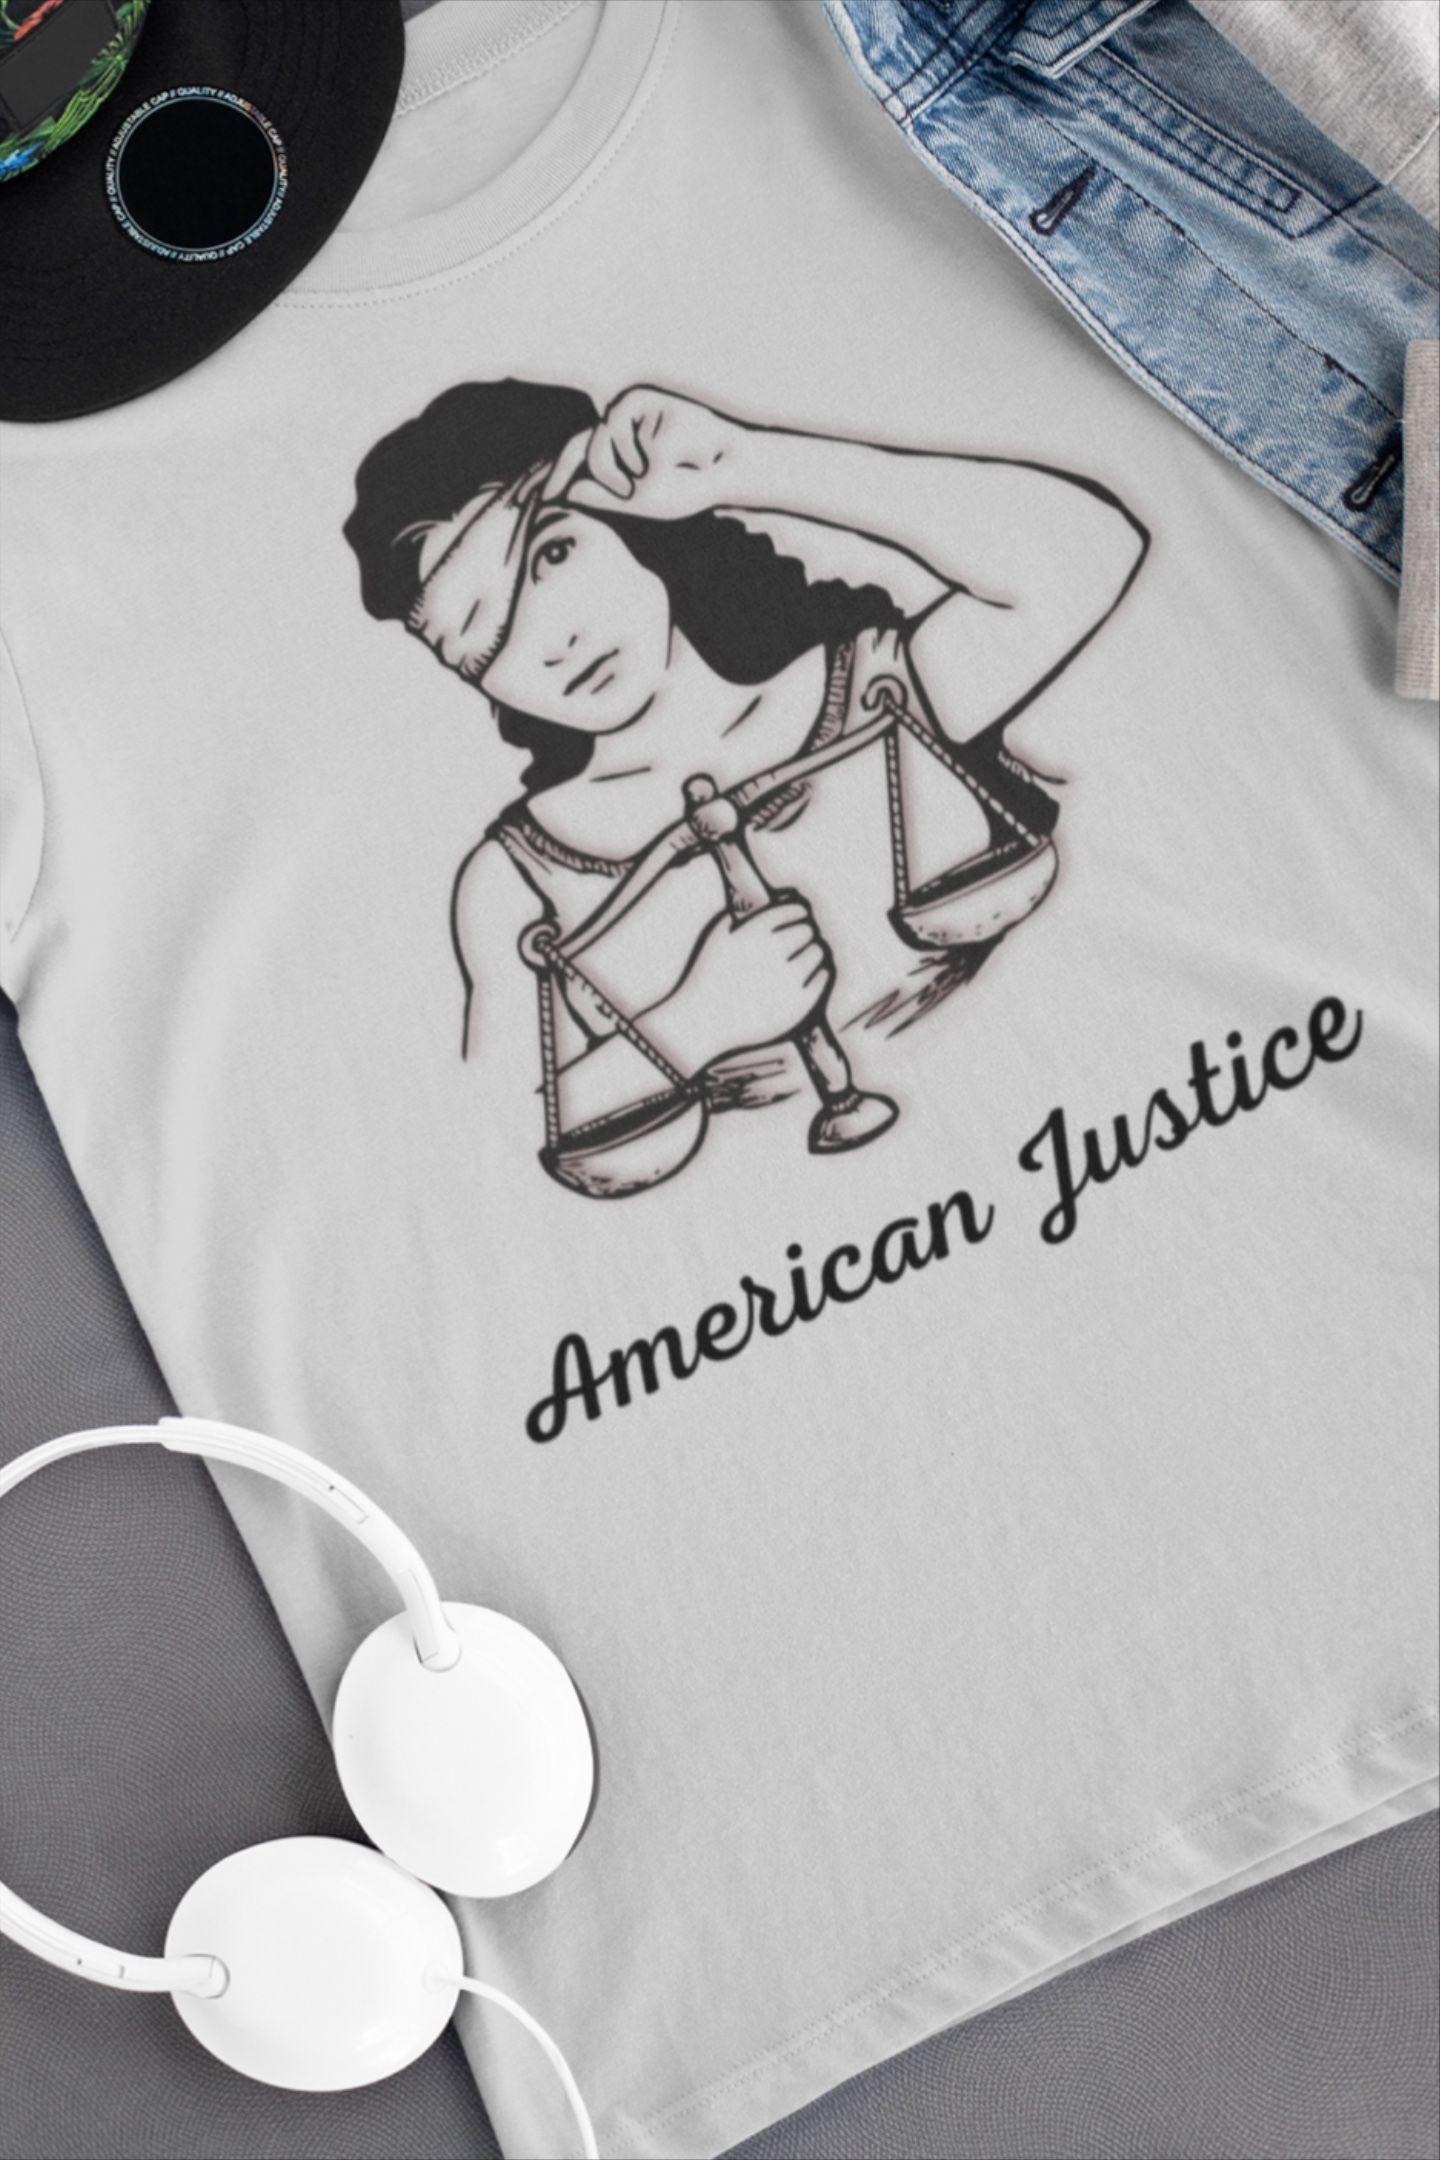 No Justice No Peace Equality Juneteenth Black Lives Matter Etsy In 2020 Black Lives Matter Light Fabric Black Lives